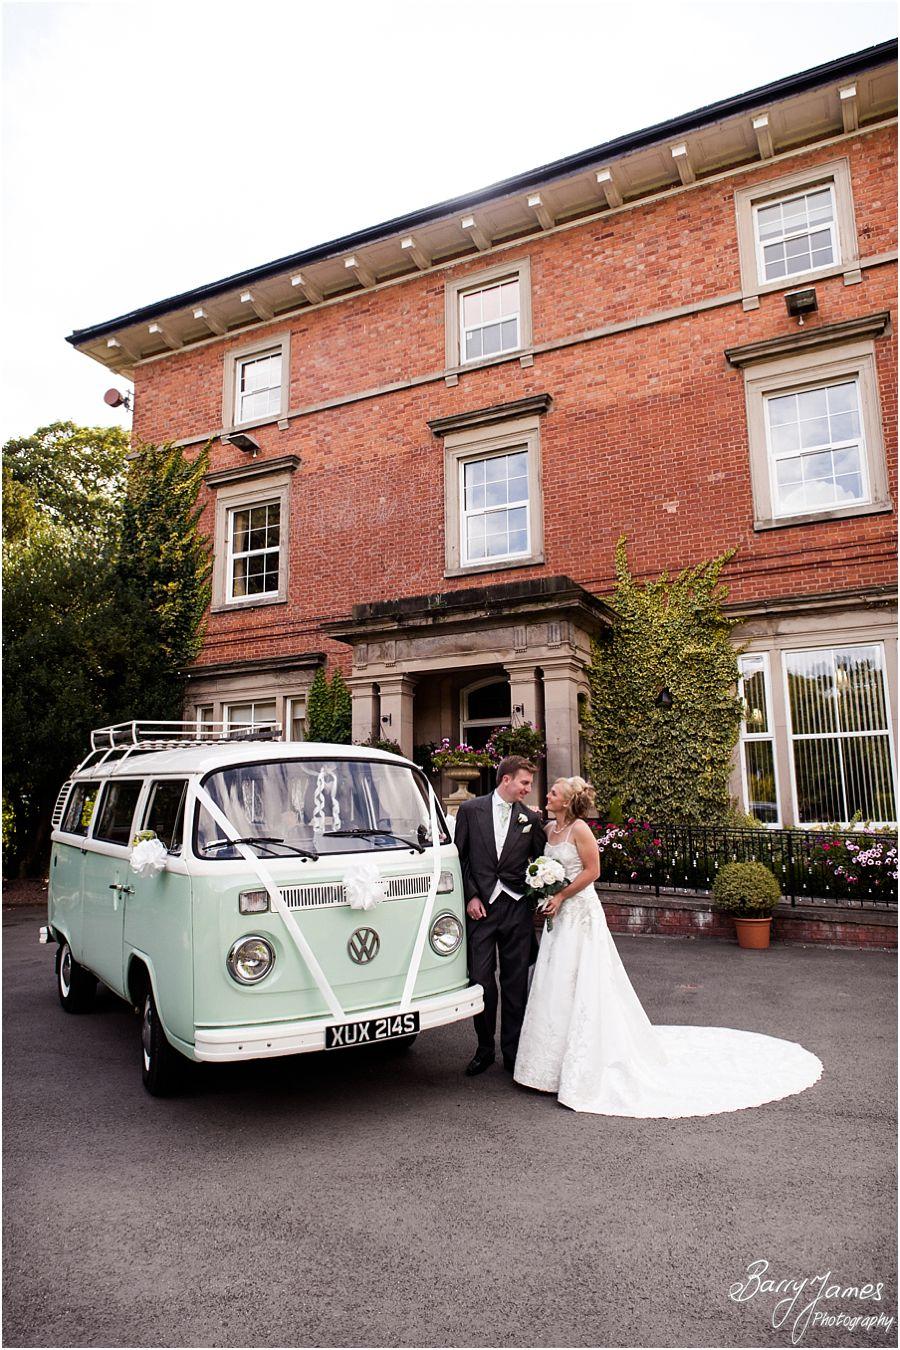 Beautiful summer wedding photos at Rodbaston Hall in Penkridge by Cannock Wedding Photographer Barry James